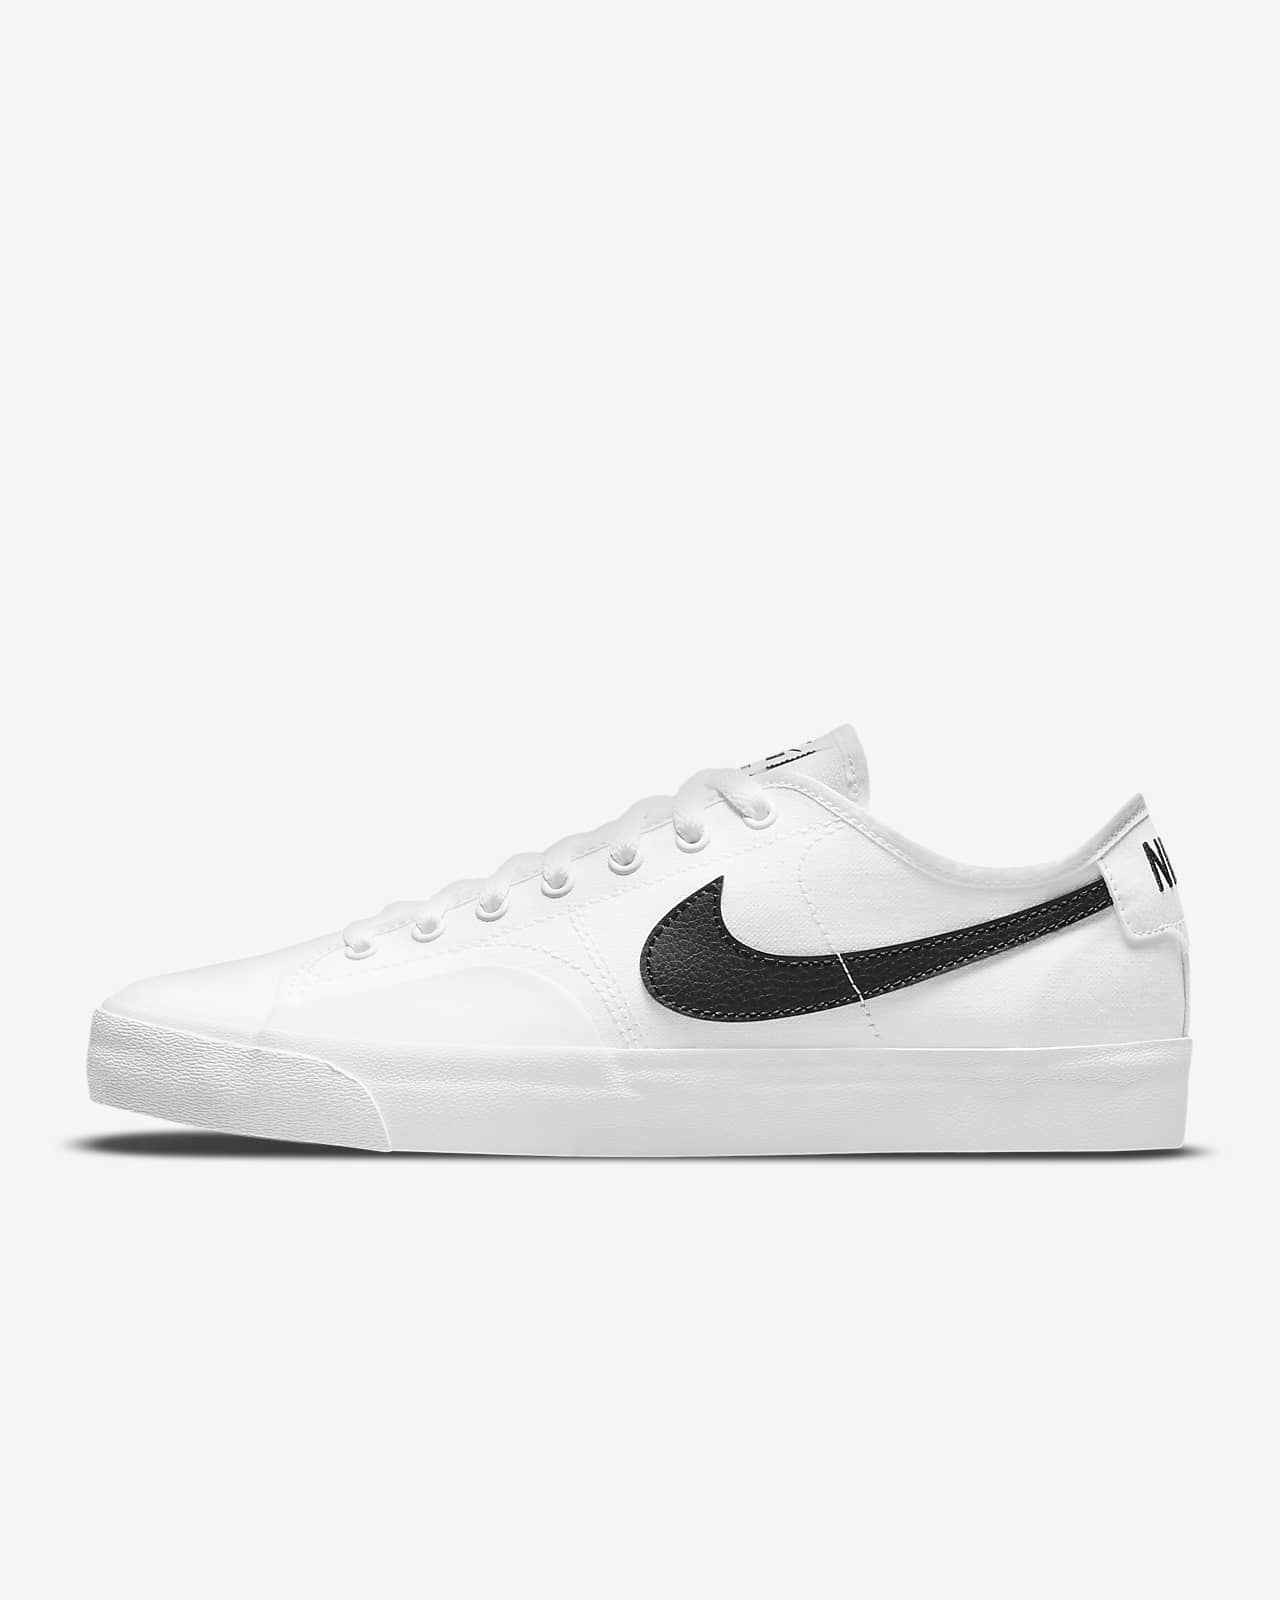 Chaussure de skateboard Nike SB BLZR Court